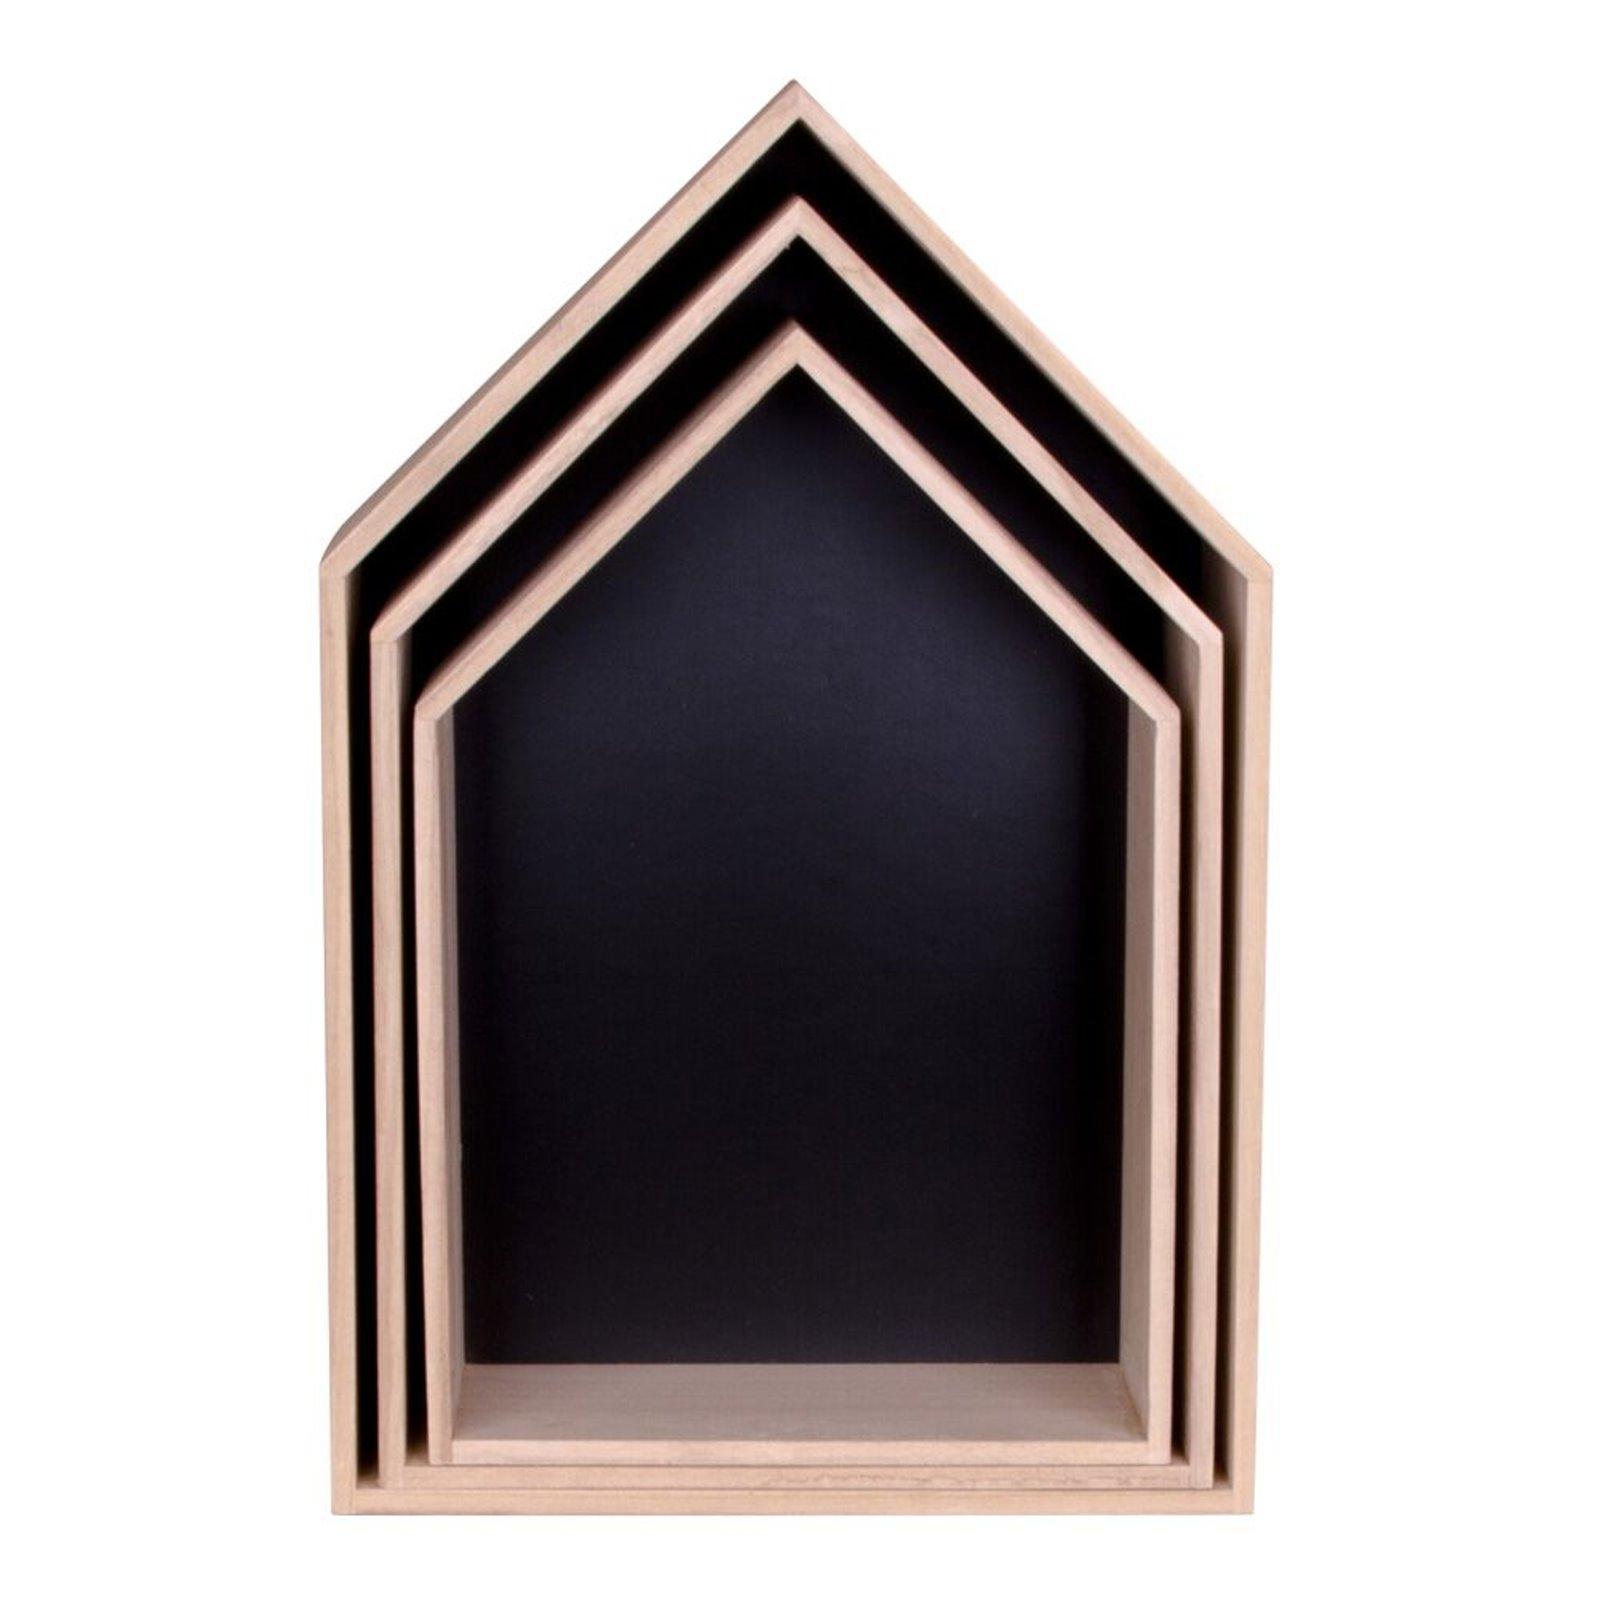 pkline regal vice 3tlg aus holz b cherregal wandregal holzregal m bel wohnen schr nke vitrinen. Black Bedroom Furniture Sets. Home Design Ideas